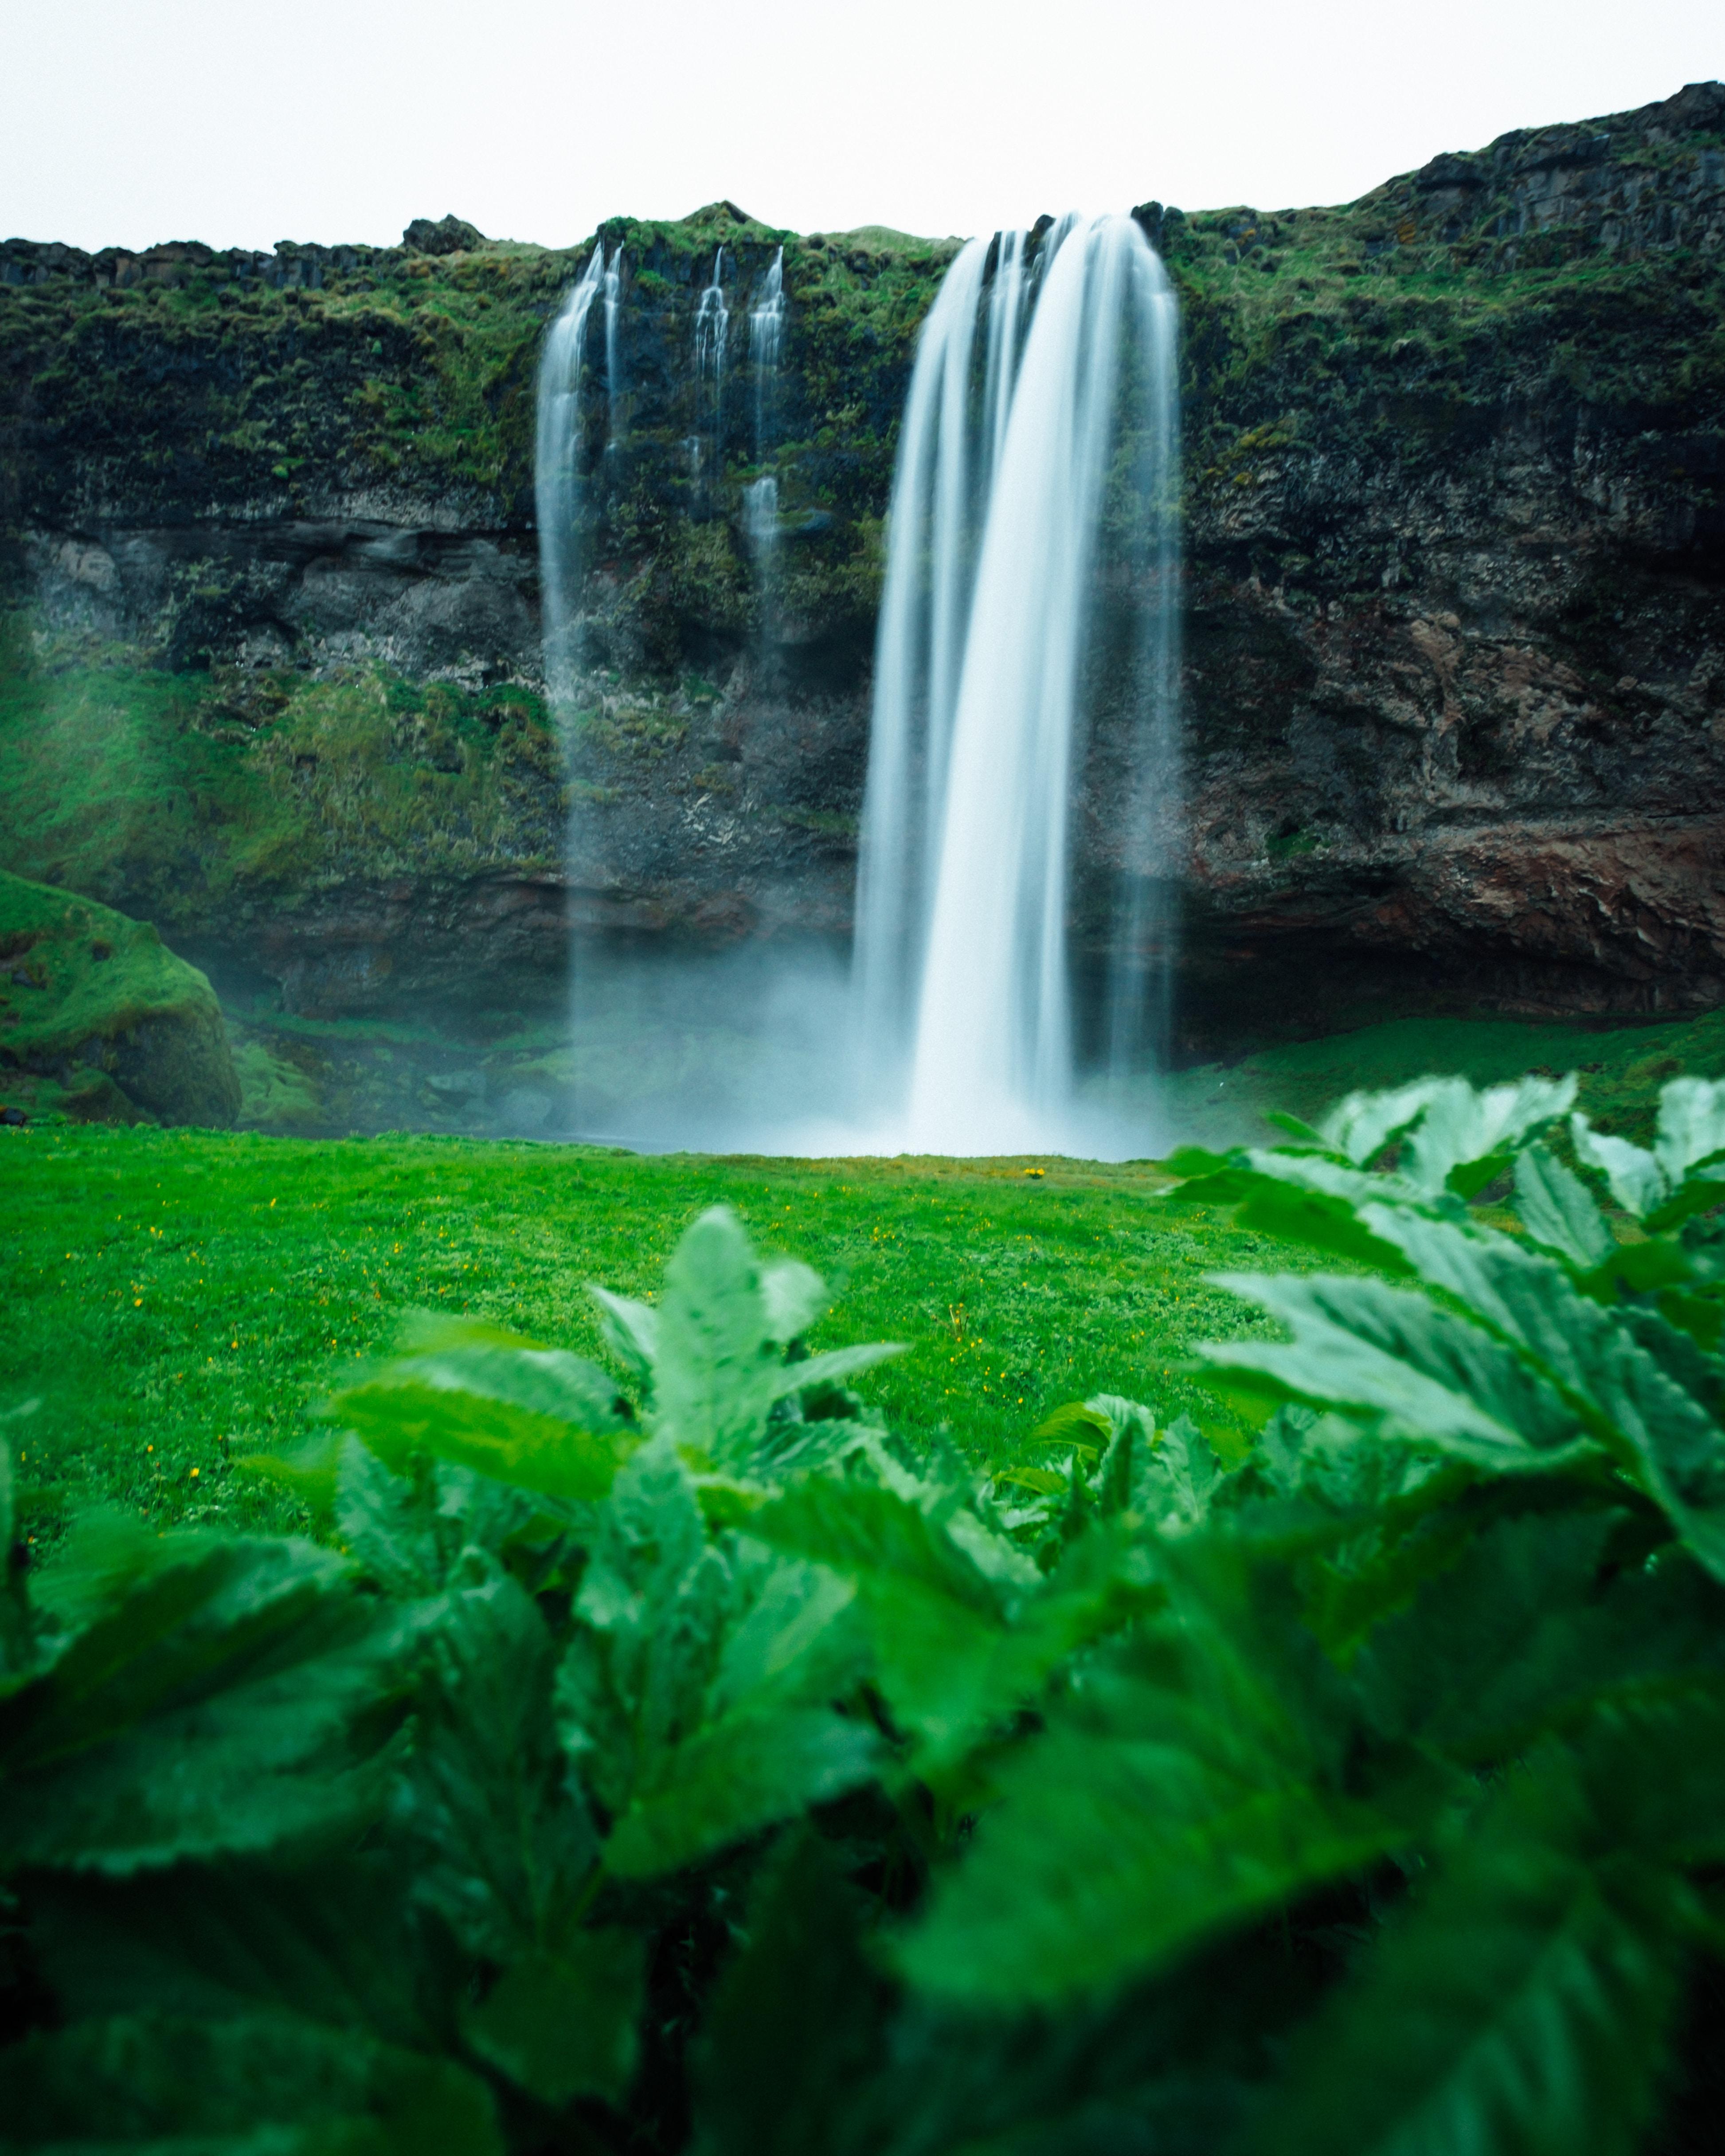 macro shot of waterfalls